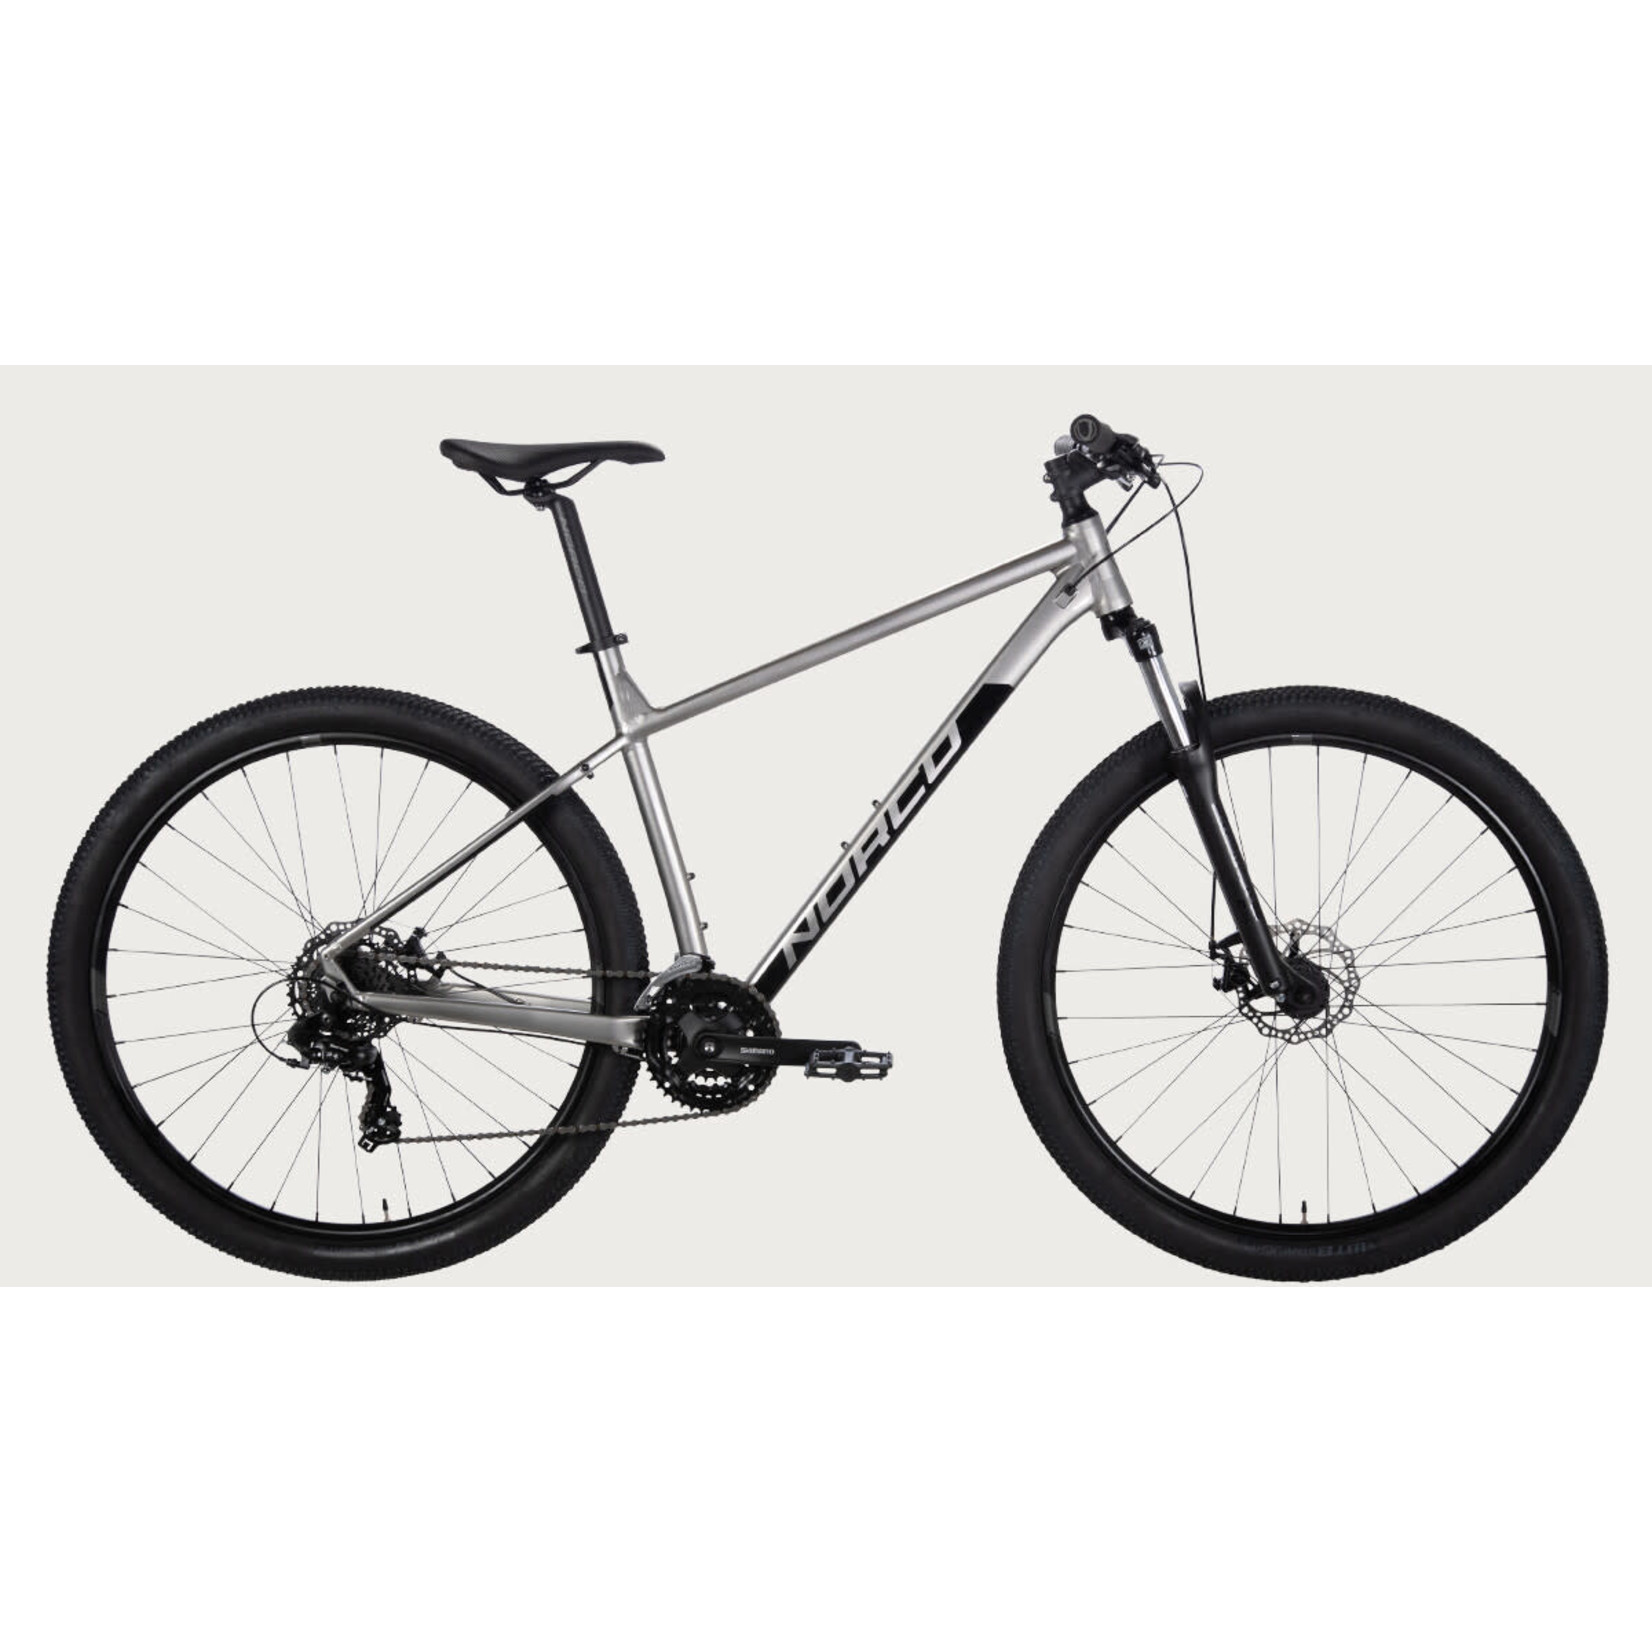 Norco Bike Norco Storm 5 Silver/Black 27.5 M